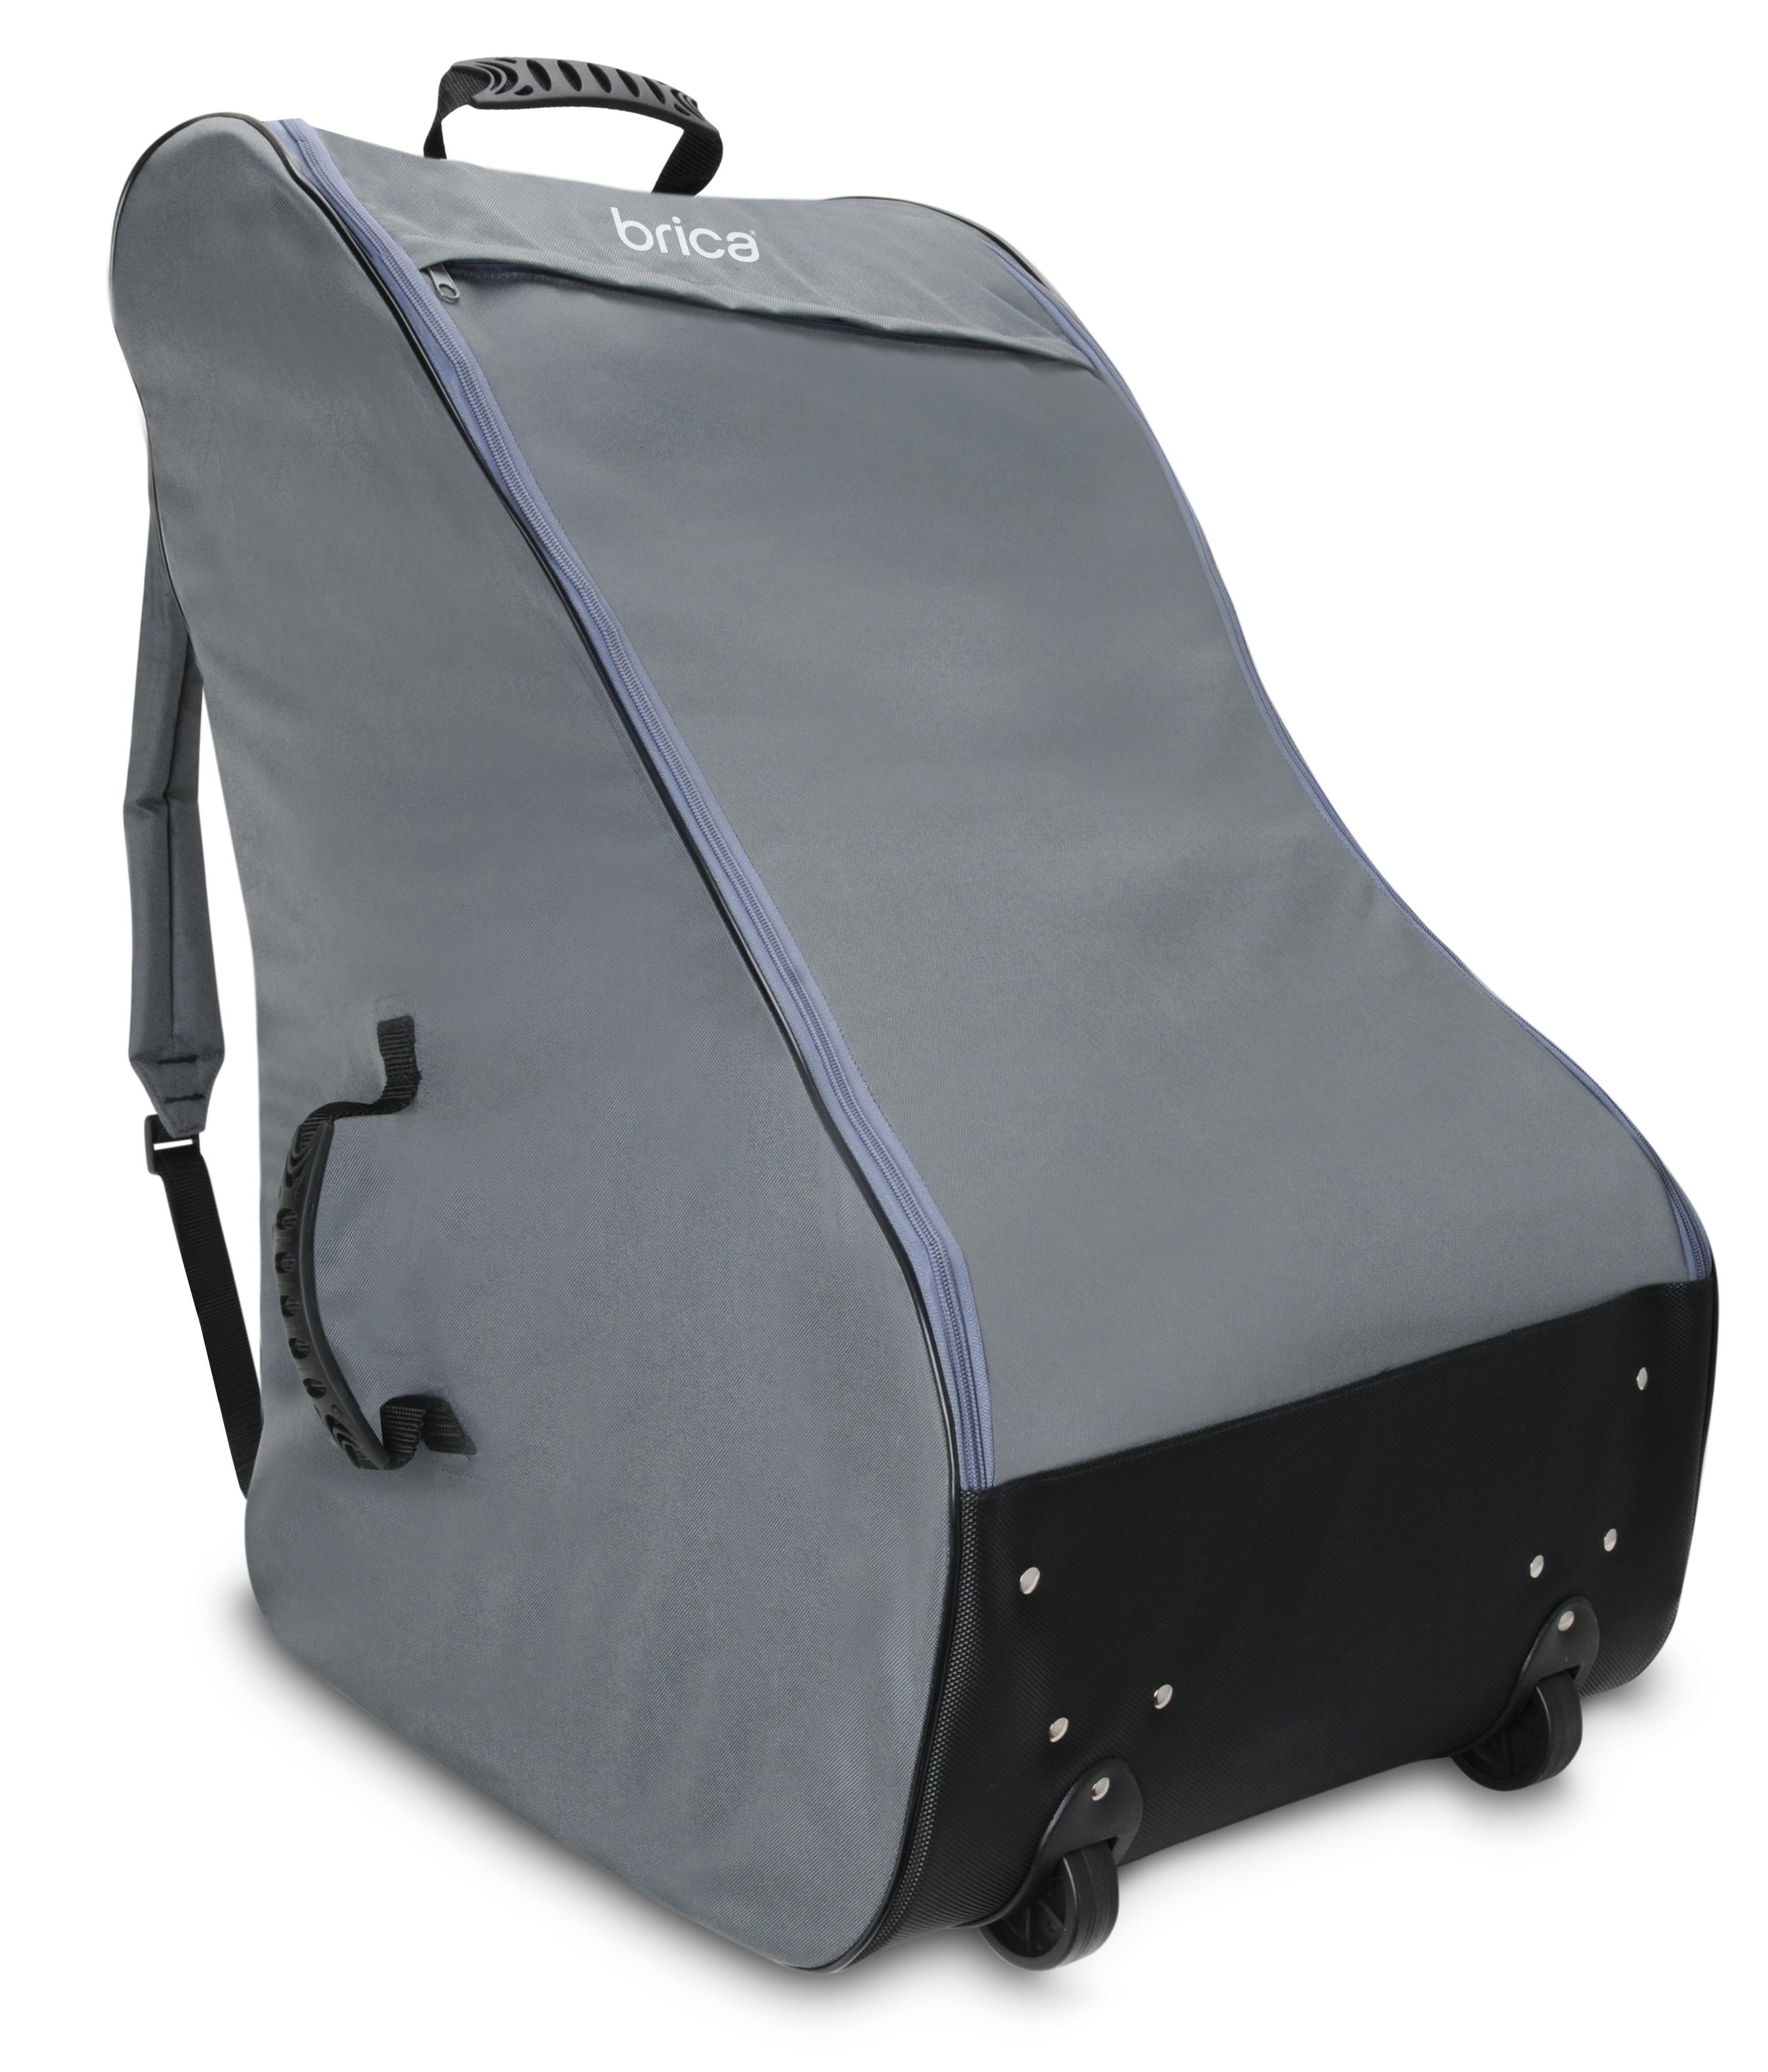 Munchkin Brica Cover Guard Car Seat Travel Tote Baby